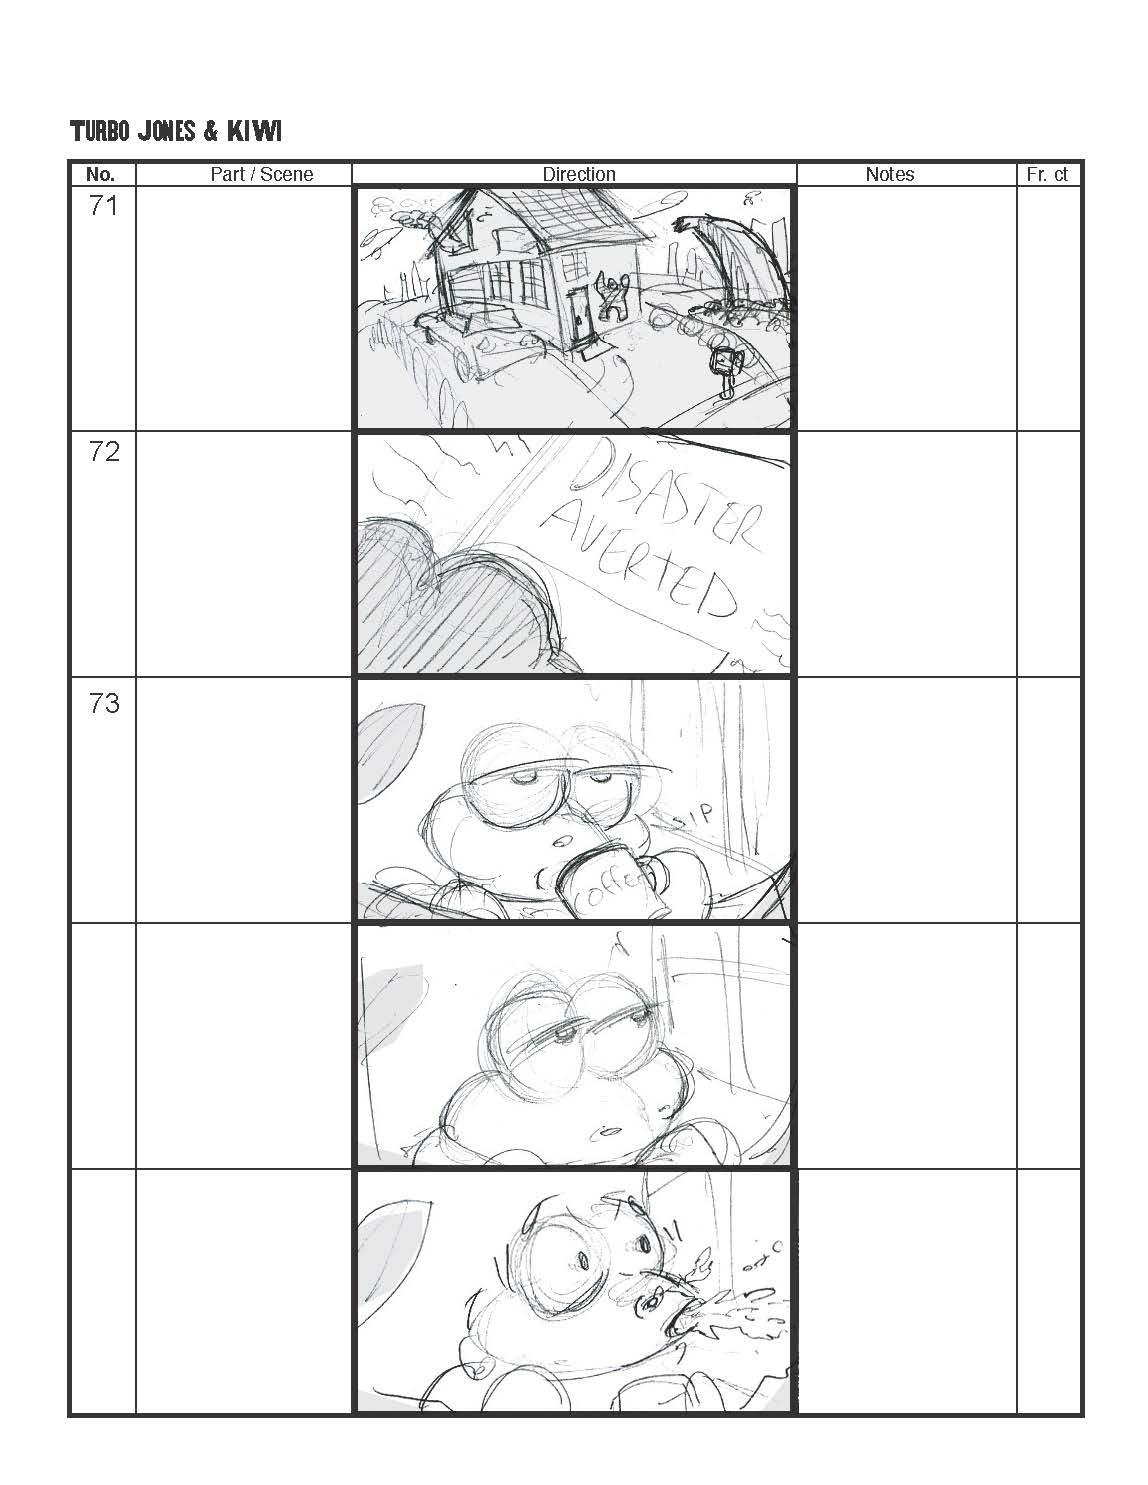 TJK_Storyboards_v01_HIGH_Page_35.jpg